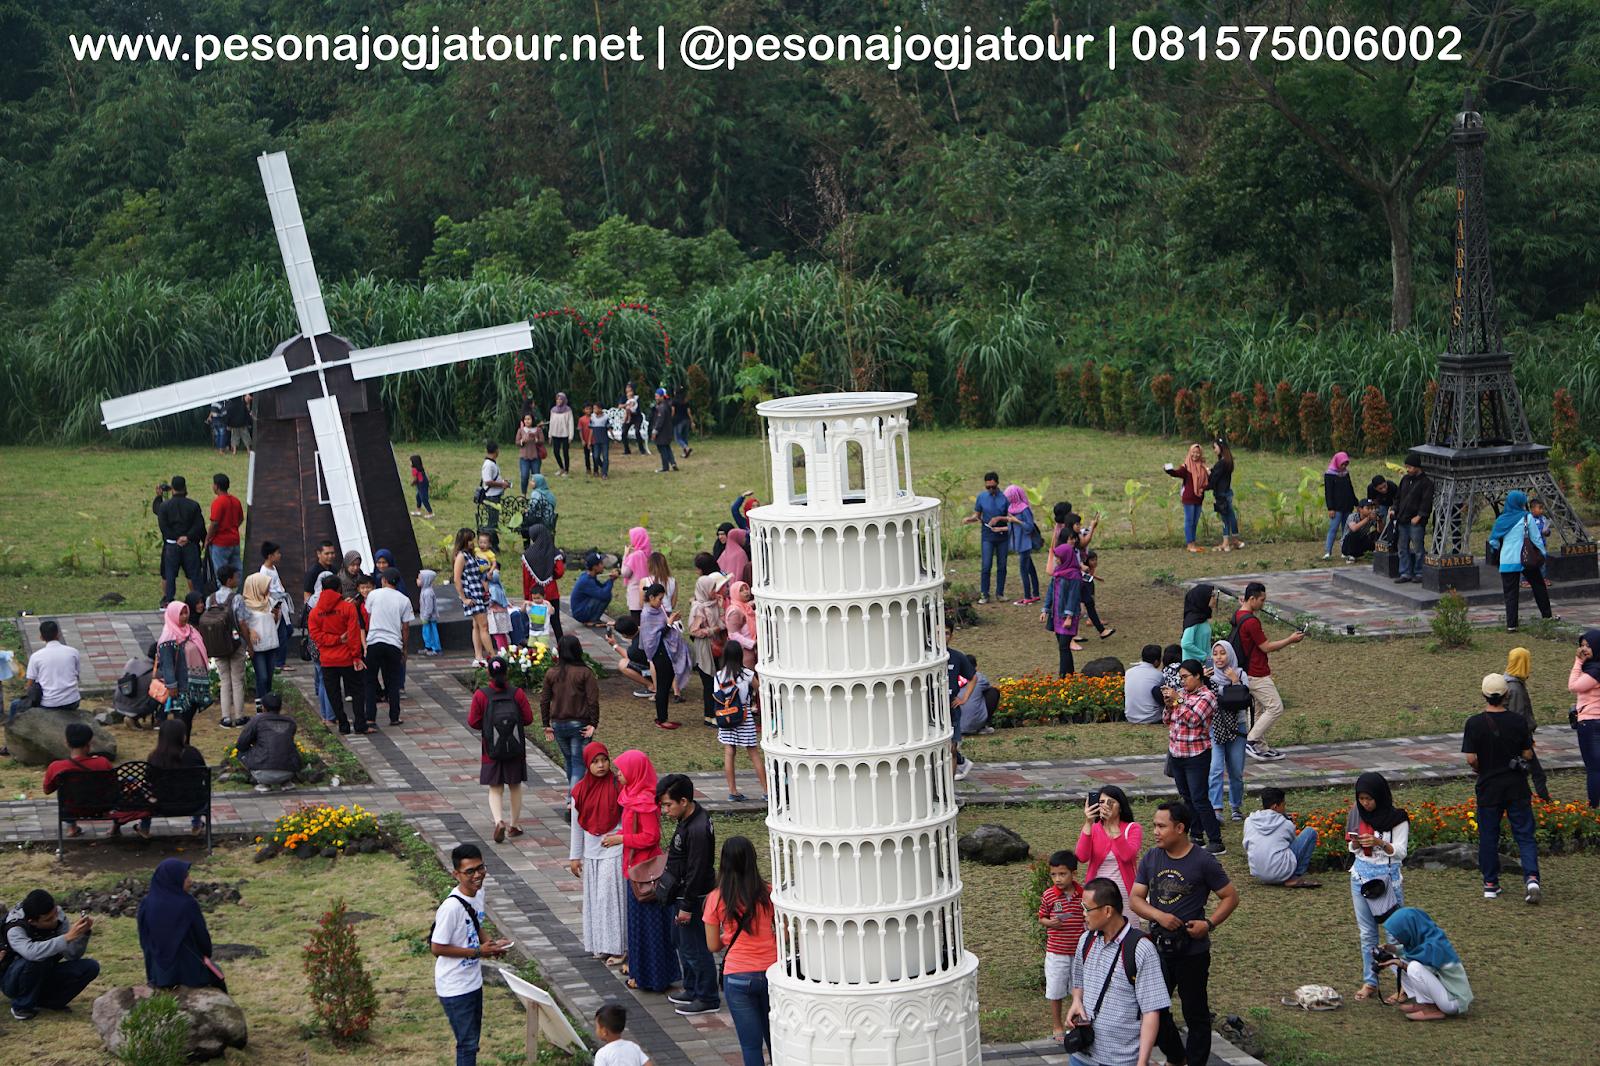 Harga Tiket Dan Rute Ke Merapi Park Jogja 2019 Paket Wisata Jogja